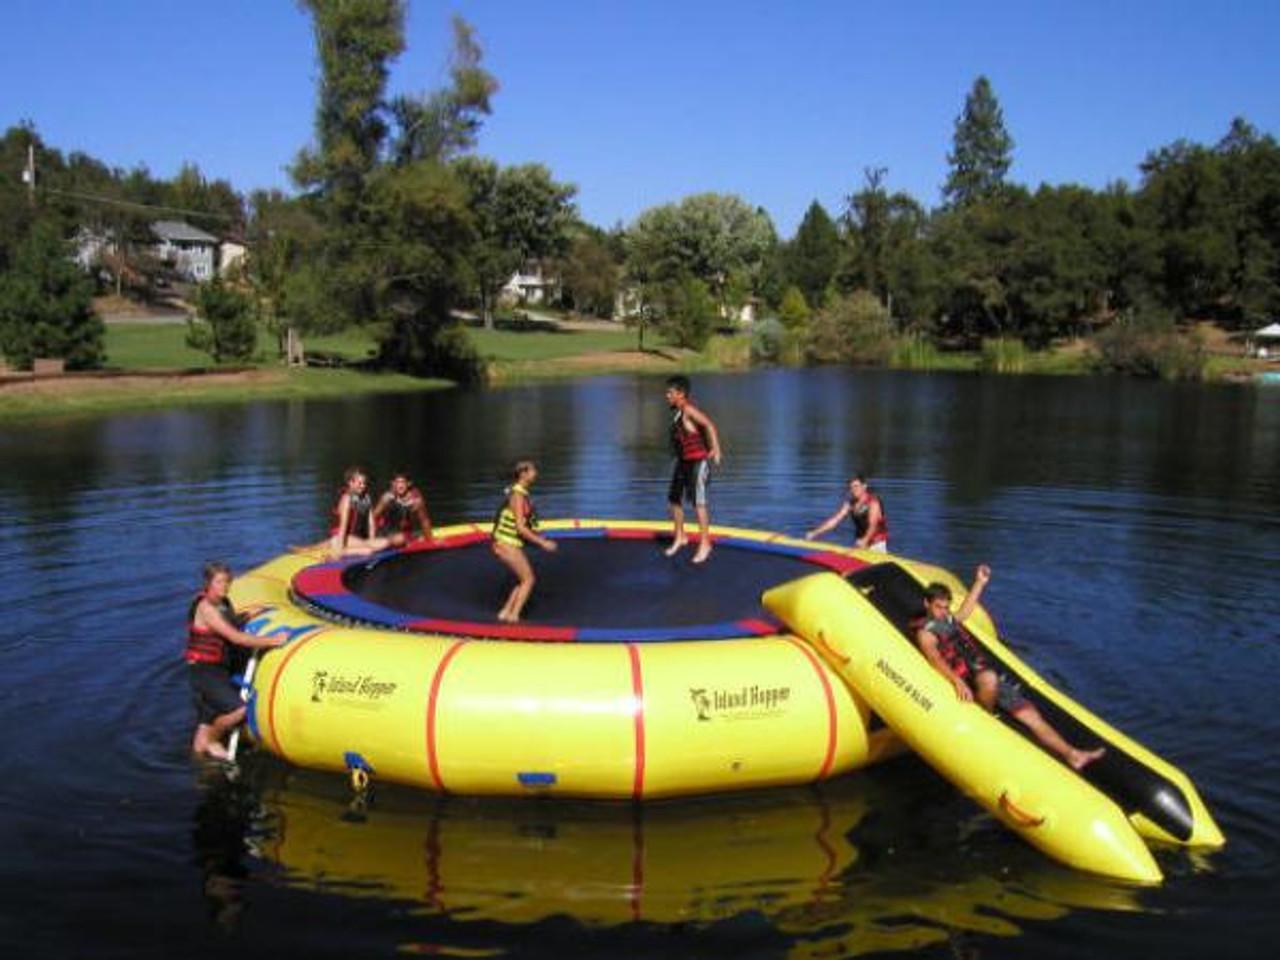 The Island Hopper Giant Jump 25'